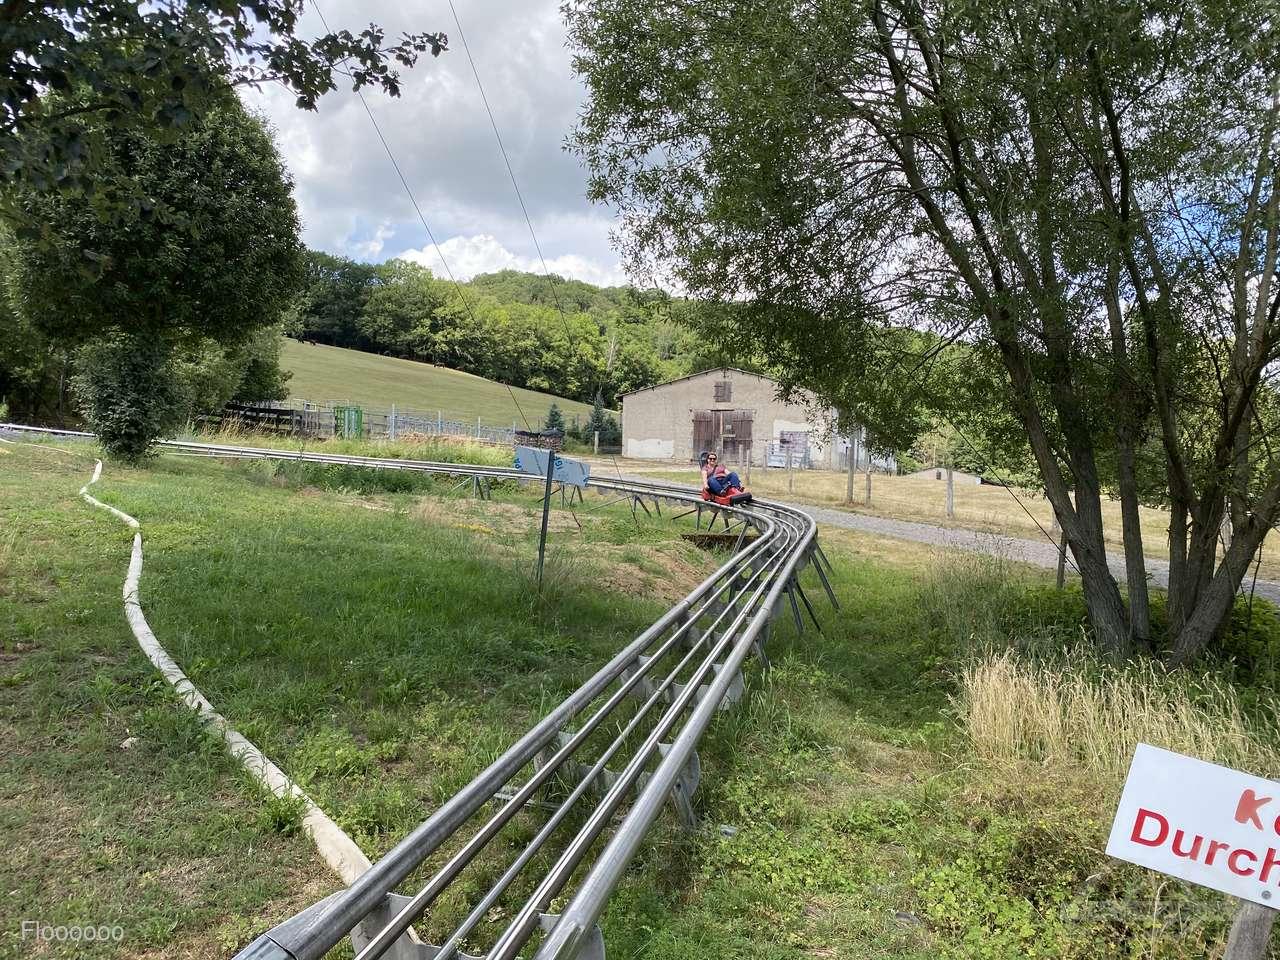 Rodelbahn Wippra im Park Wipperia Funpark Impressionen